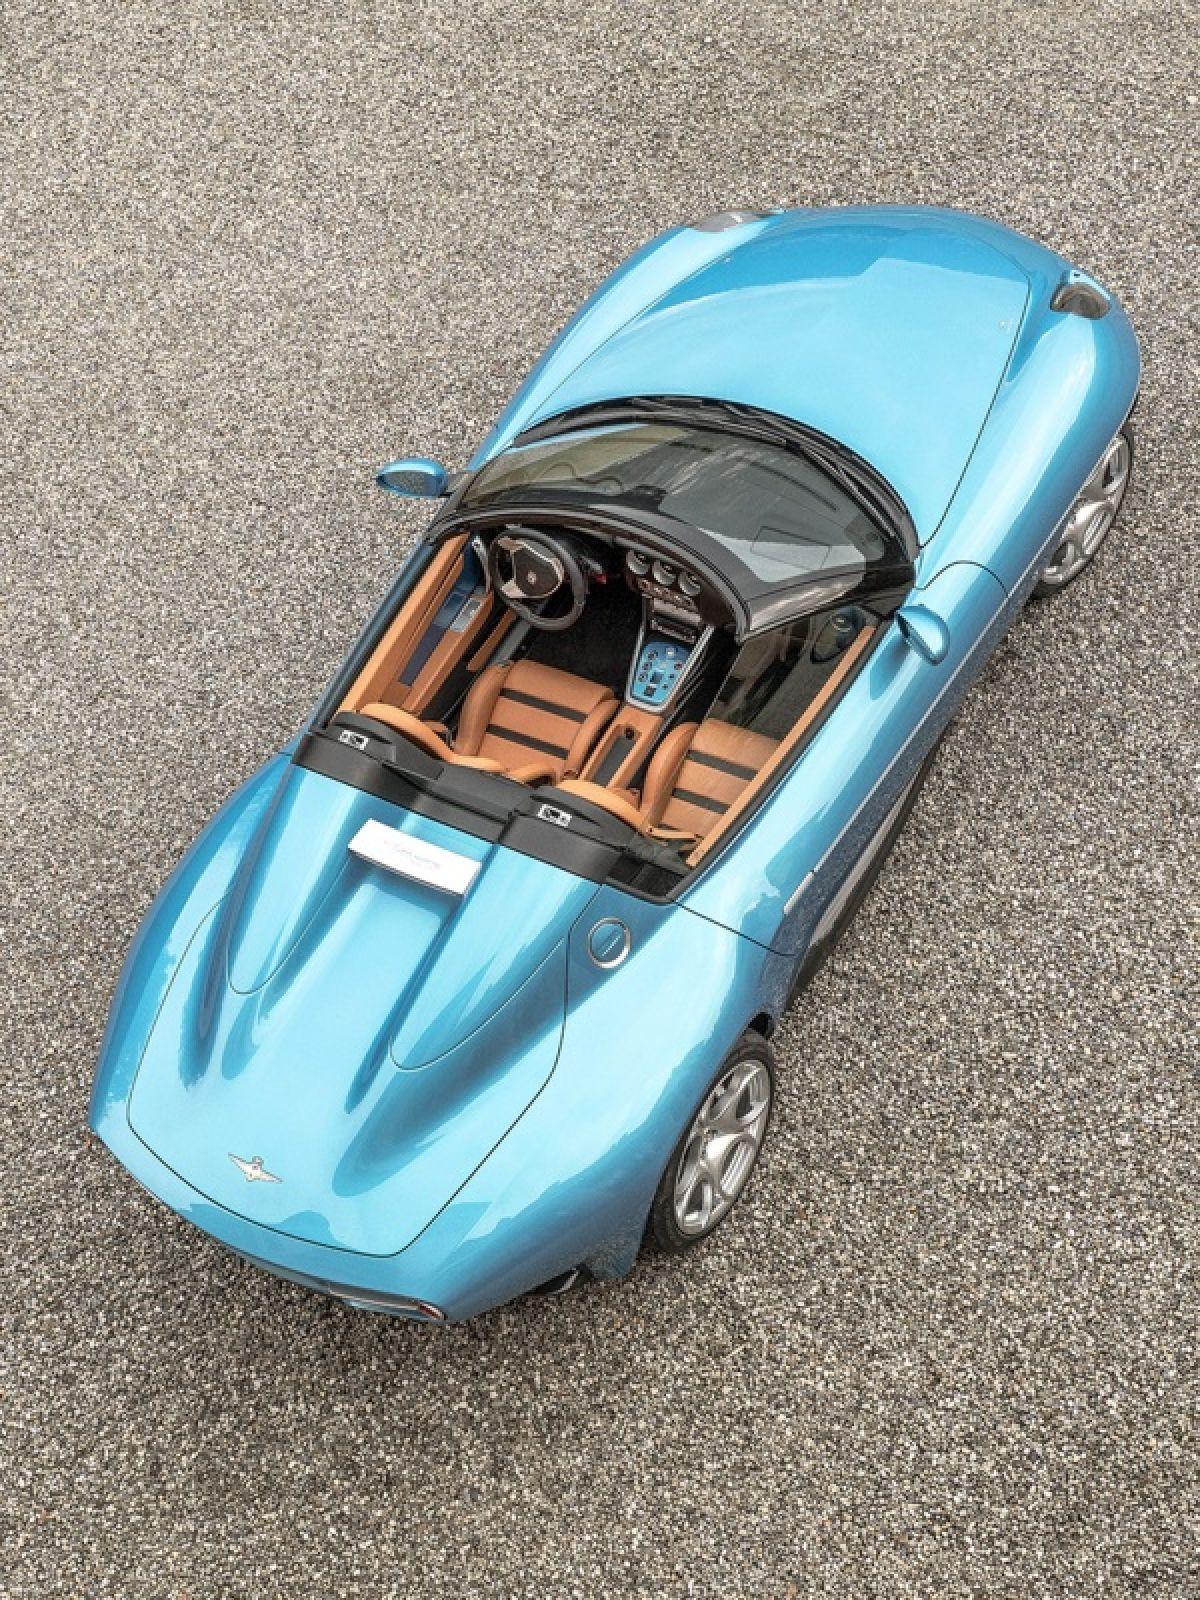 Hãng độ Touring Superleggera ra mắt Alfa Romeo Disco Volante Spider